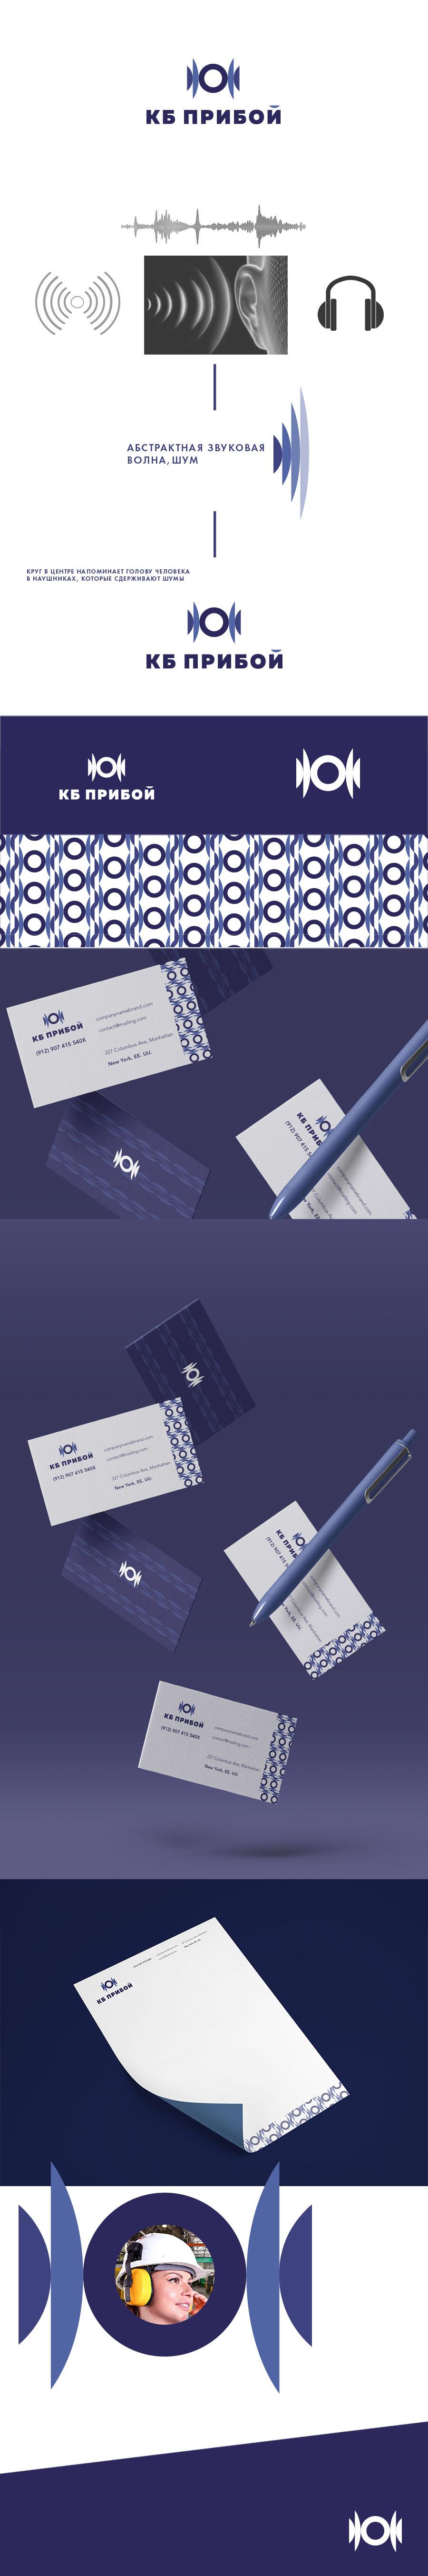 Разработка логотипа и фирменного стиля для КБ Прибой фото f_4875b28cef108cc0.jpg